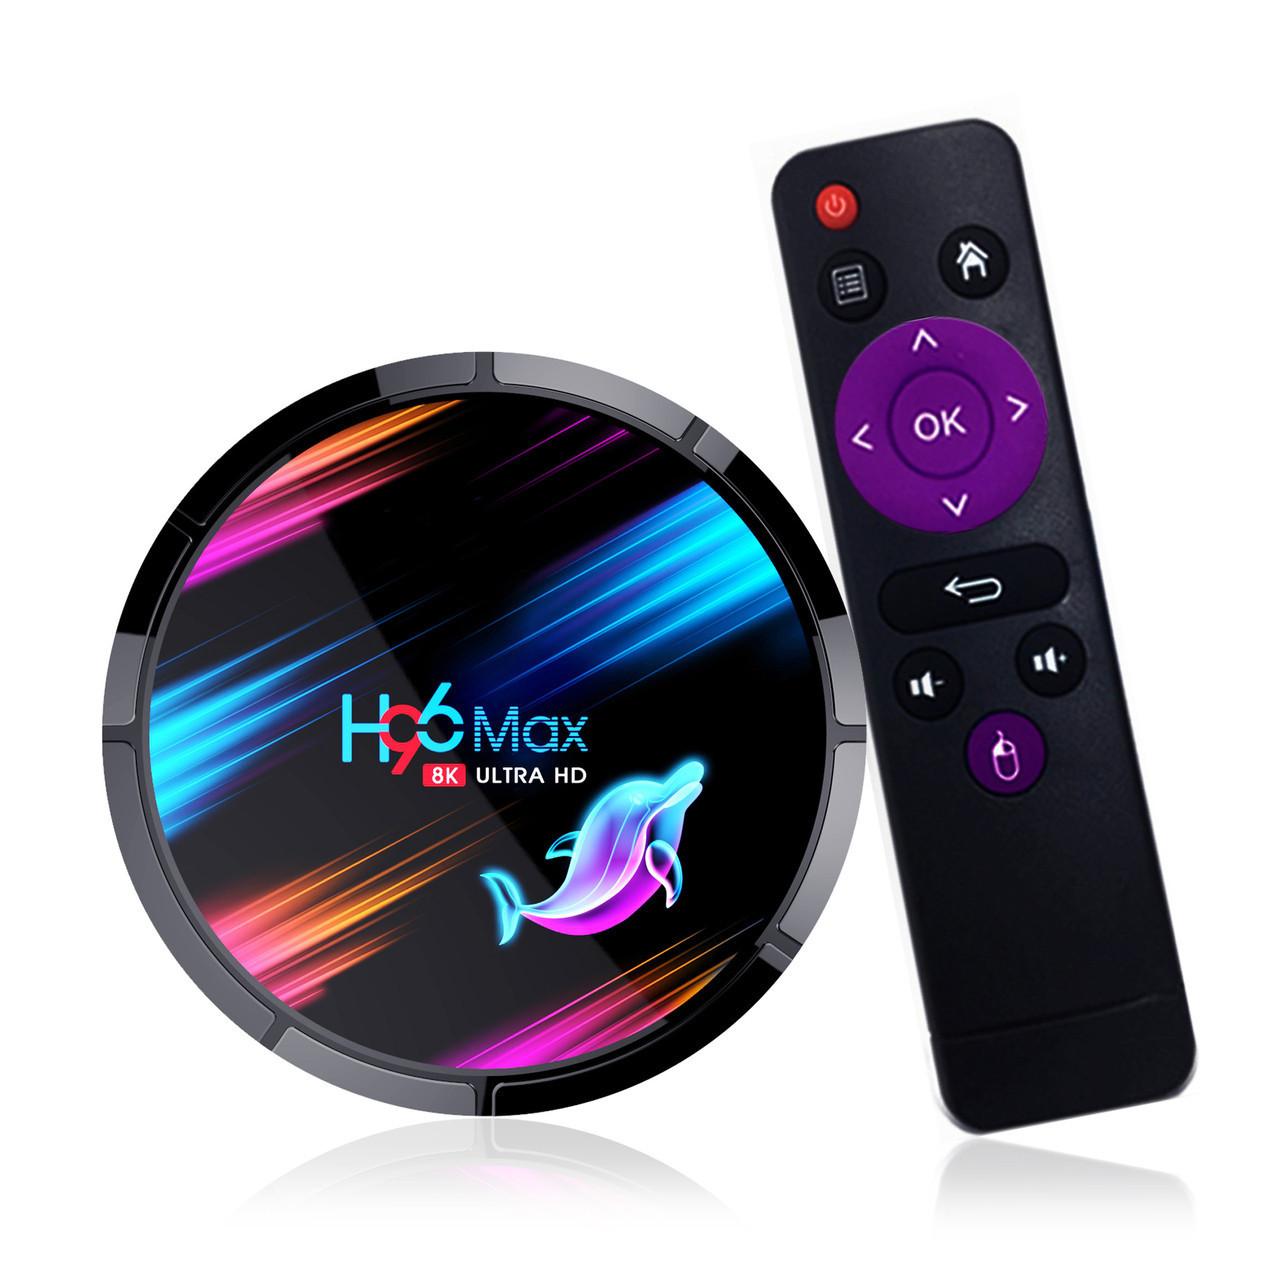 H96 Max X3 4/32, S905X3, Android 9, Smart TV Box, Смарт ТВ Приставка